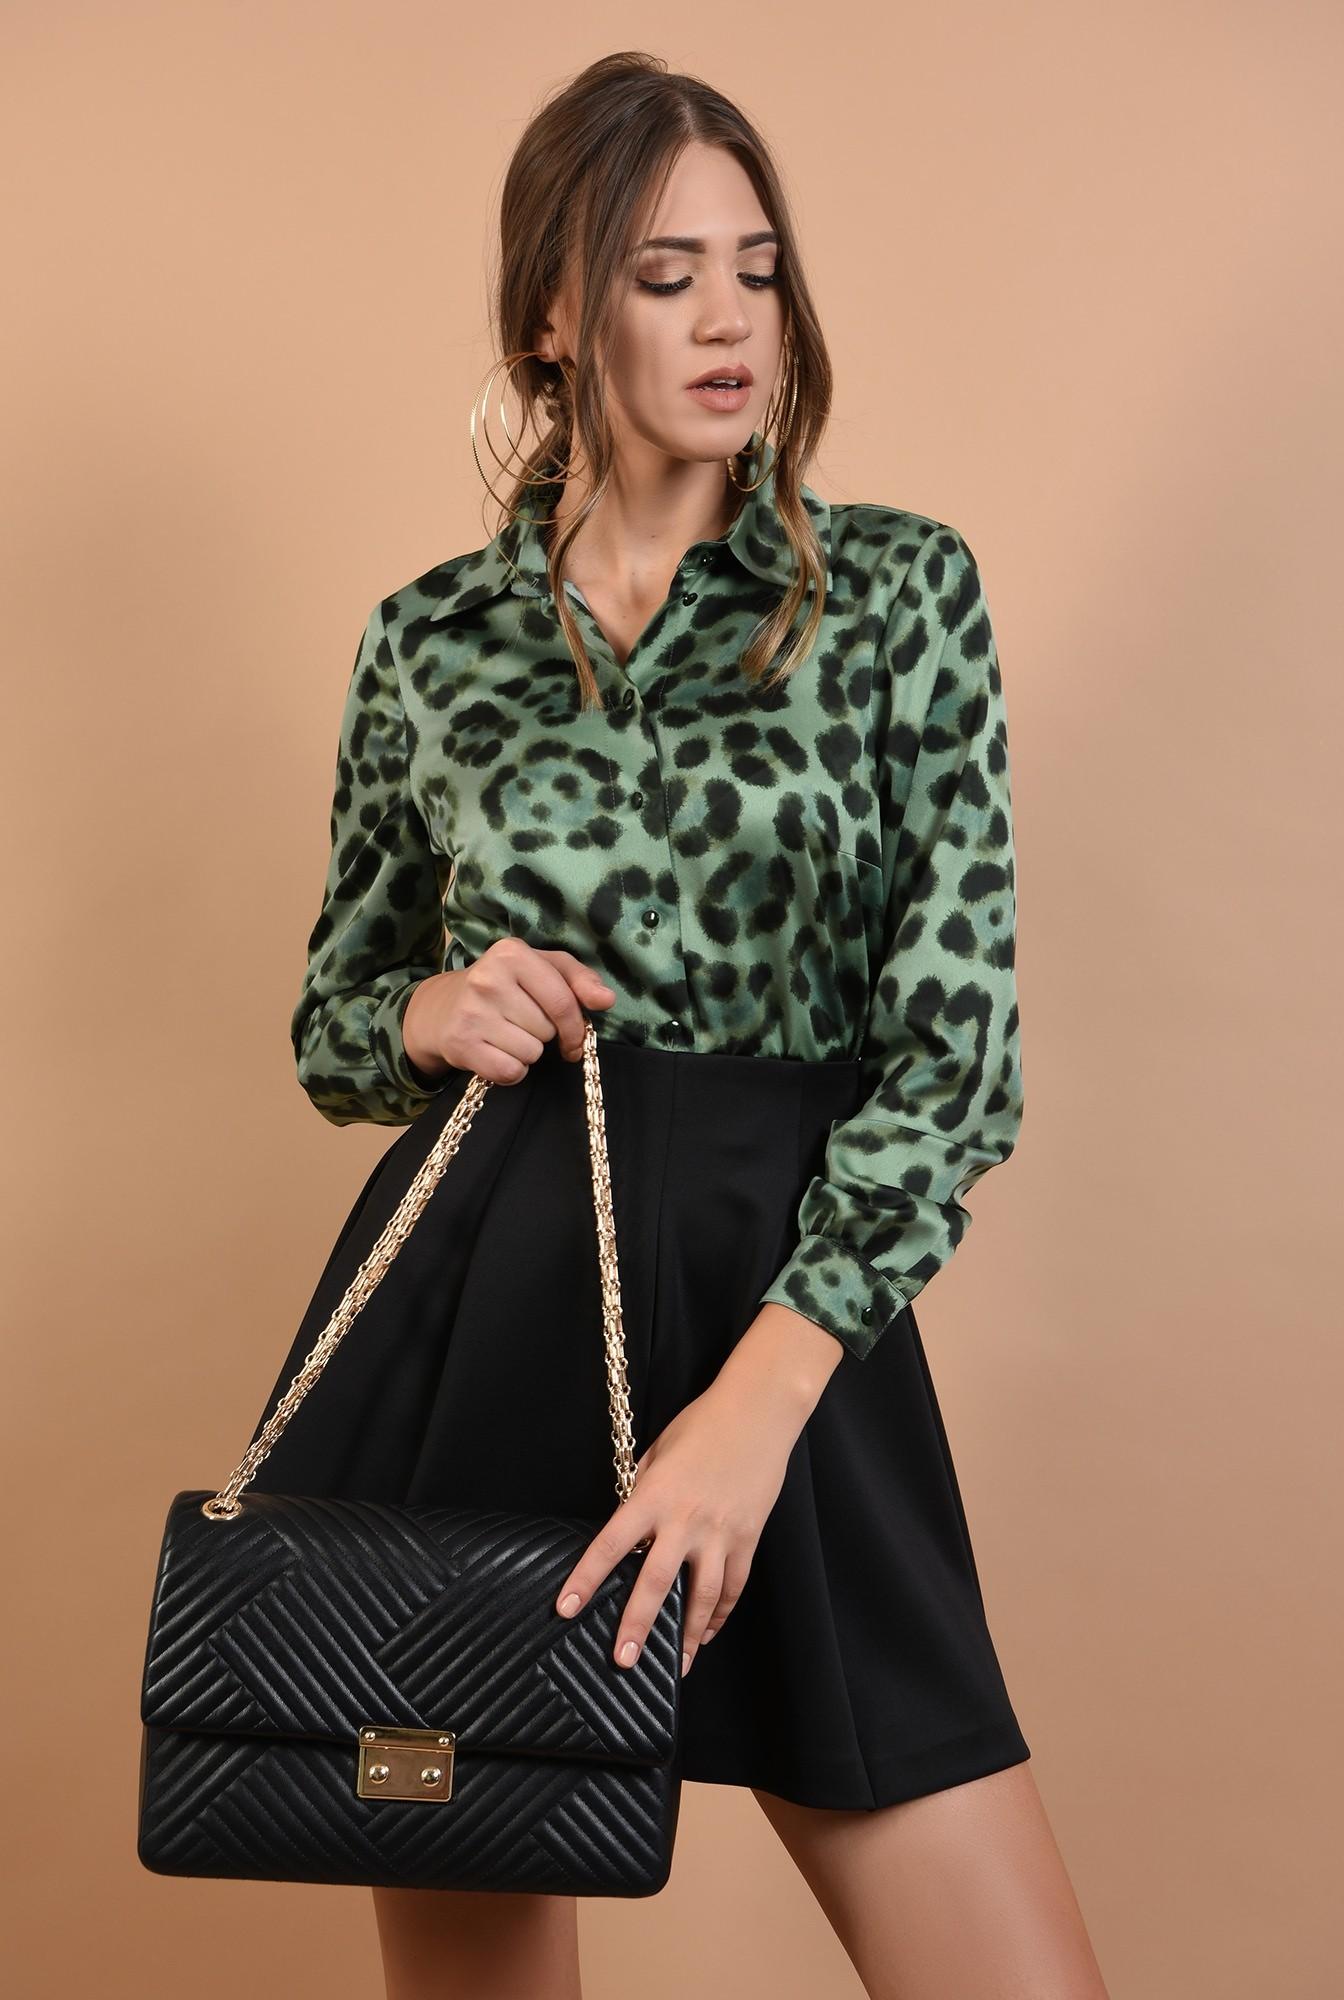 2 - camasa Poema, animal print, verde, maneci lungi, leopard